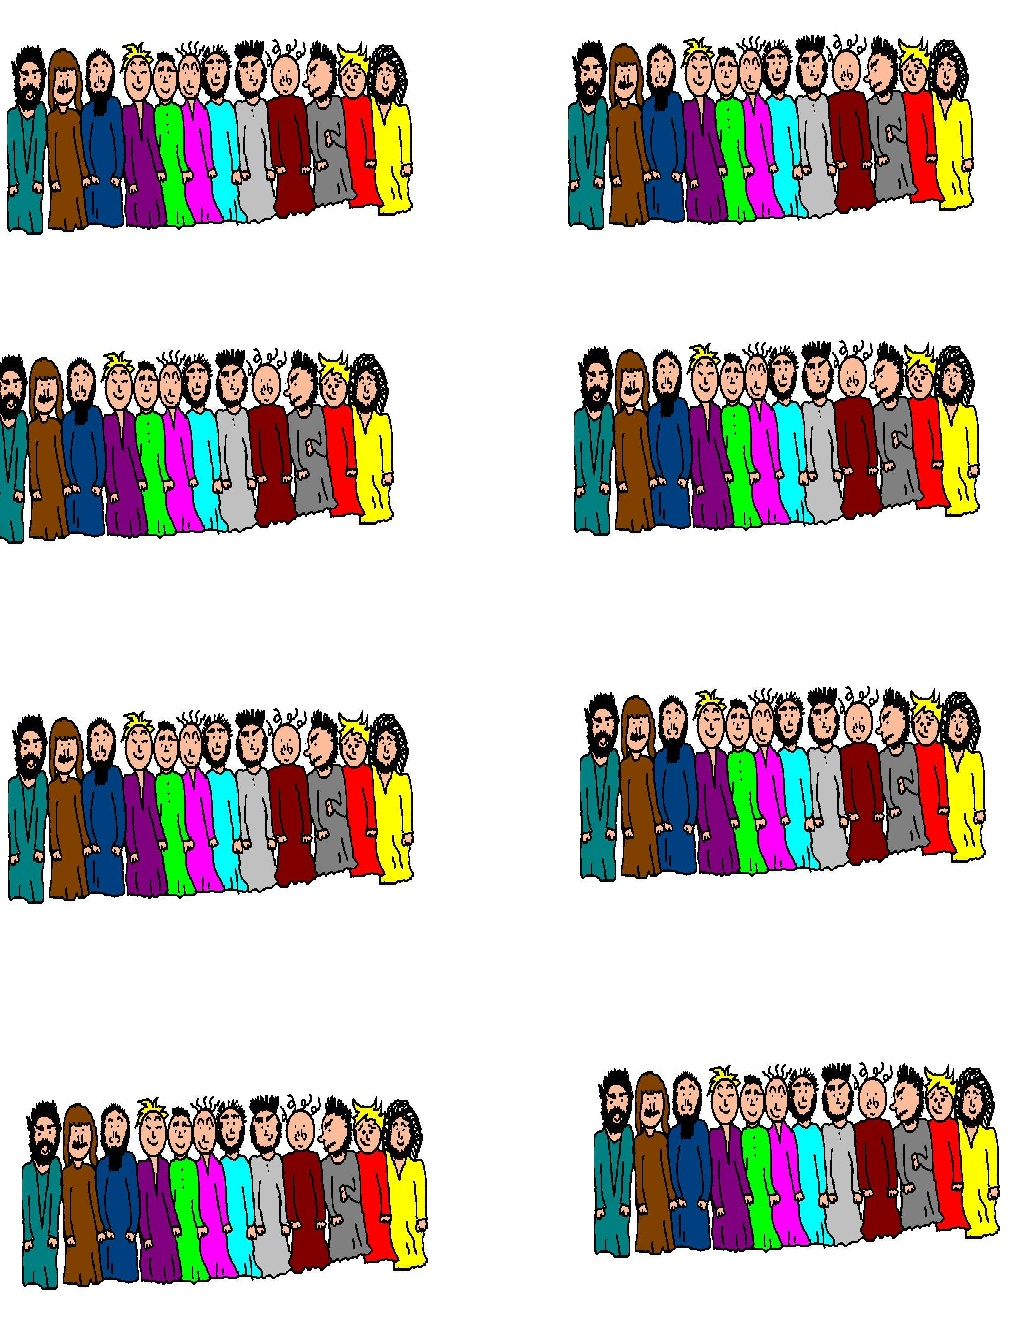 12 disciple clipart clip art freeuse stock Free Disciples Cliparts, Download Free Clip Art, Free Clip Art on ... clip art freeuse stock